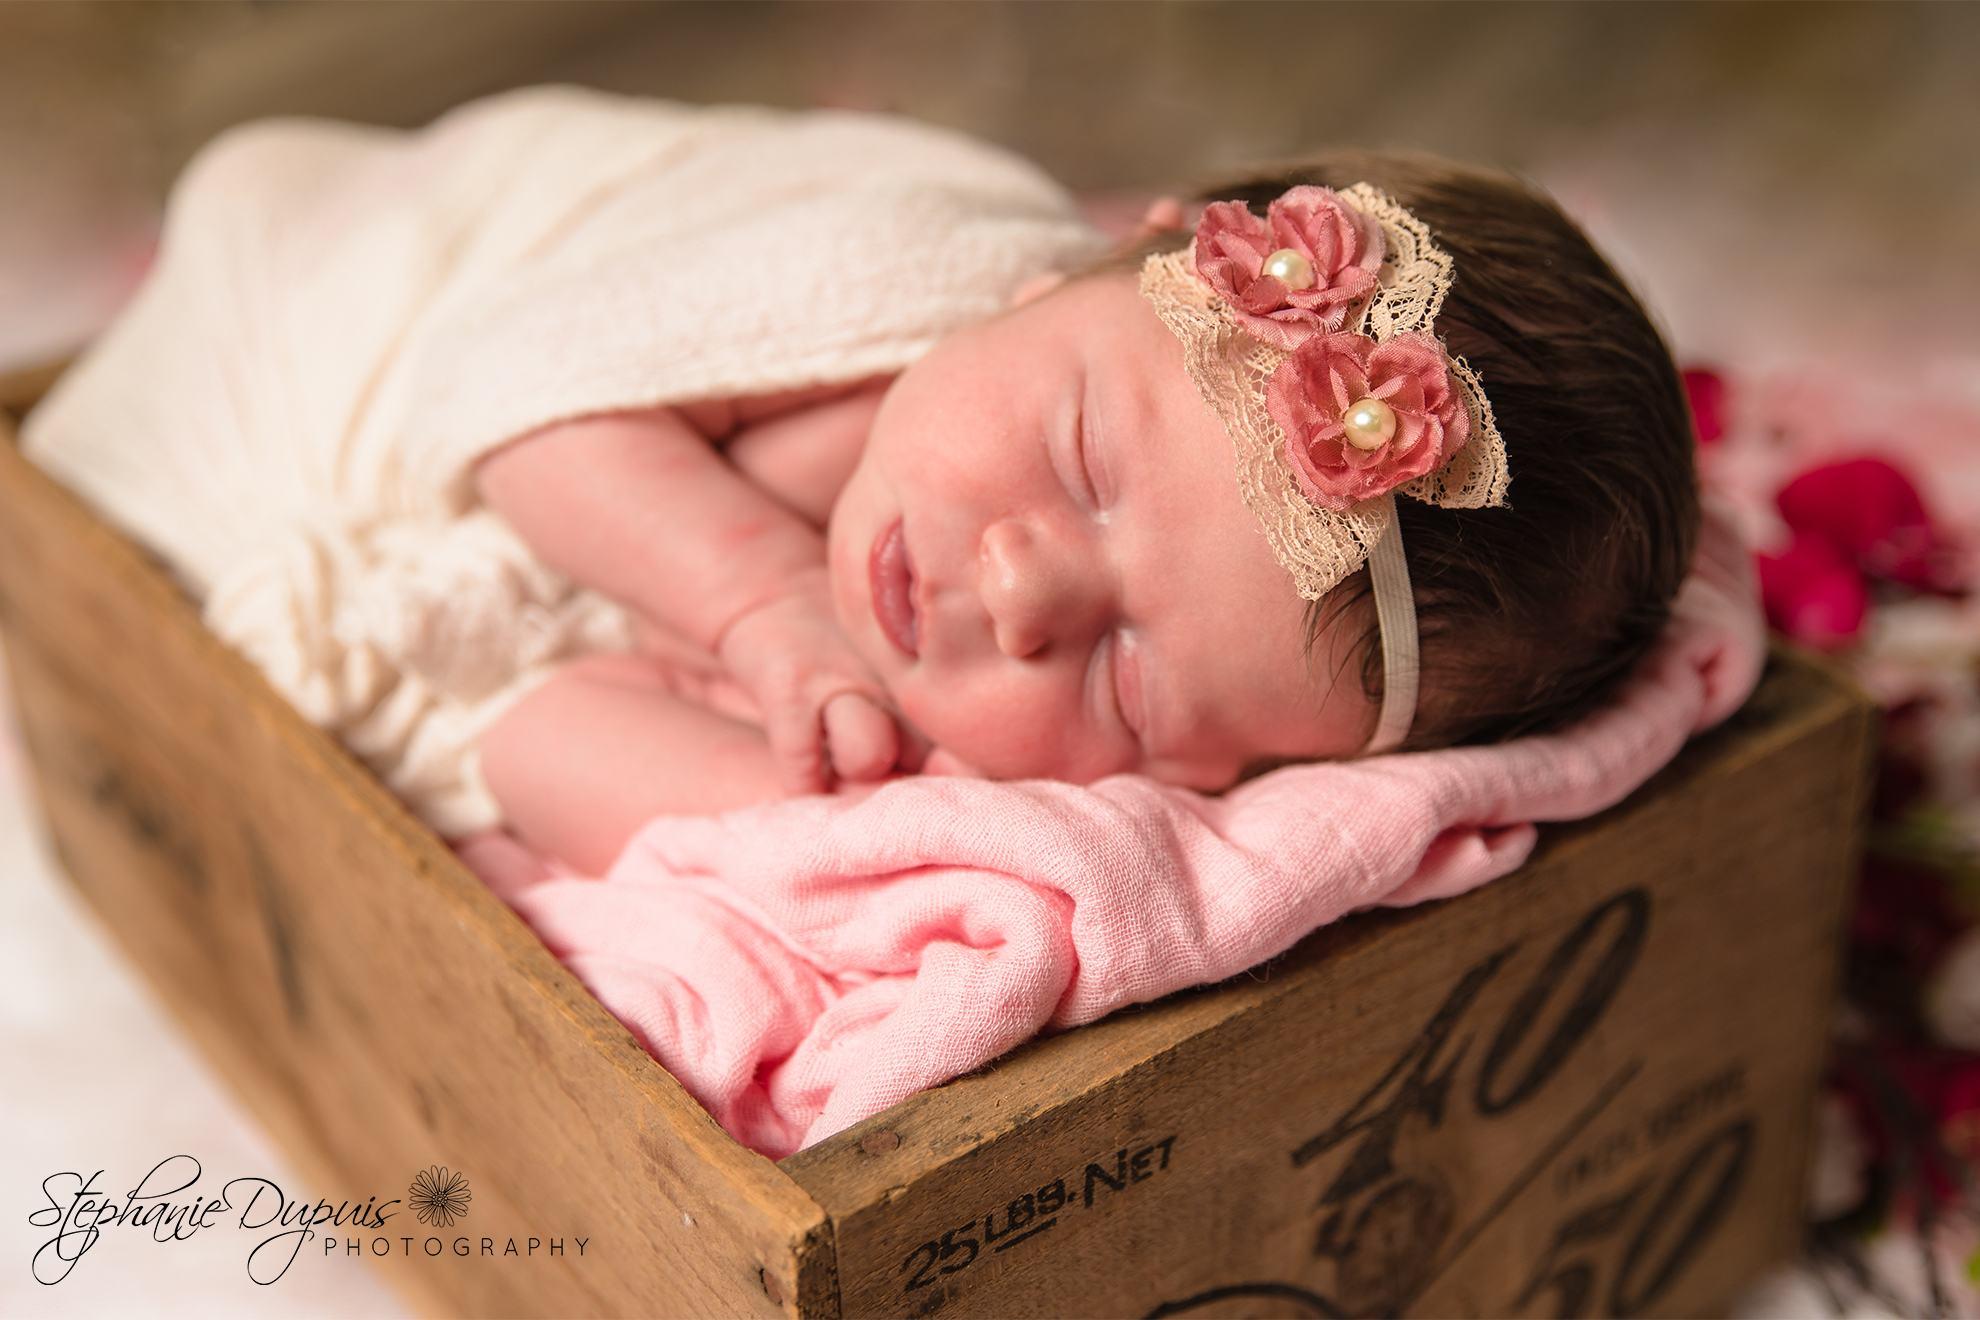 Trisha Eckherdt Infant 1003 - Portfolio: Rayia - Infant Session